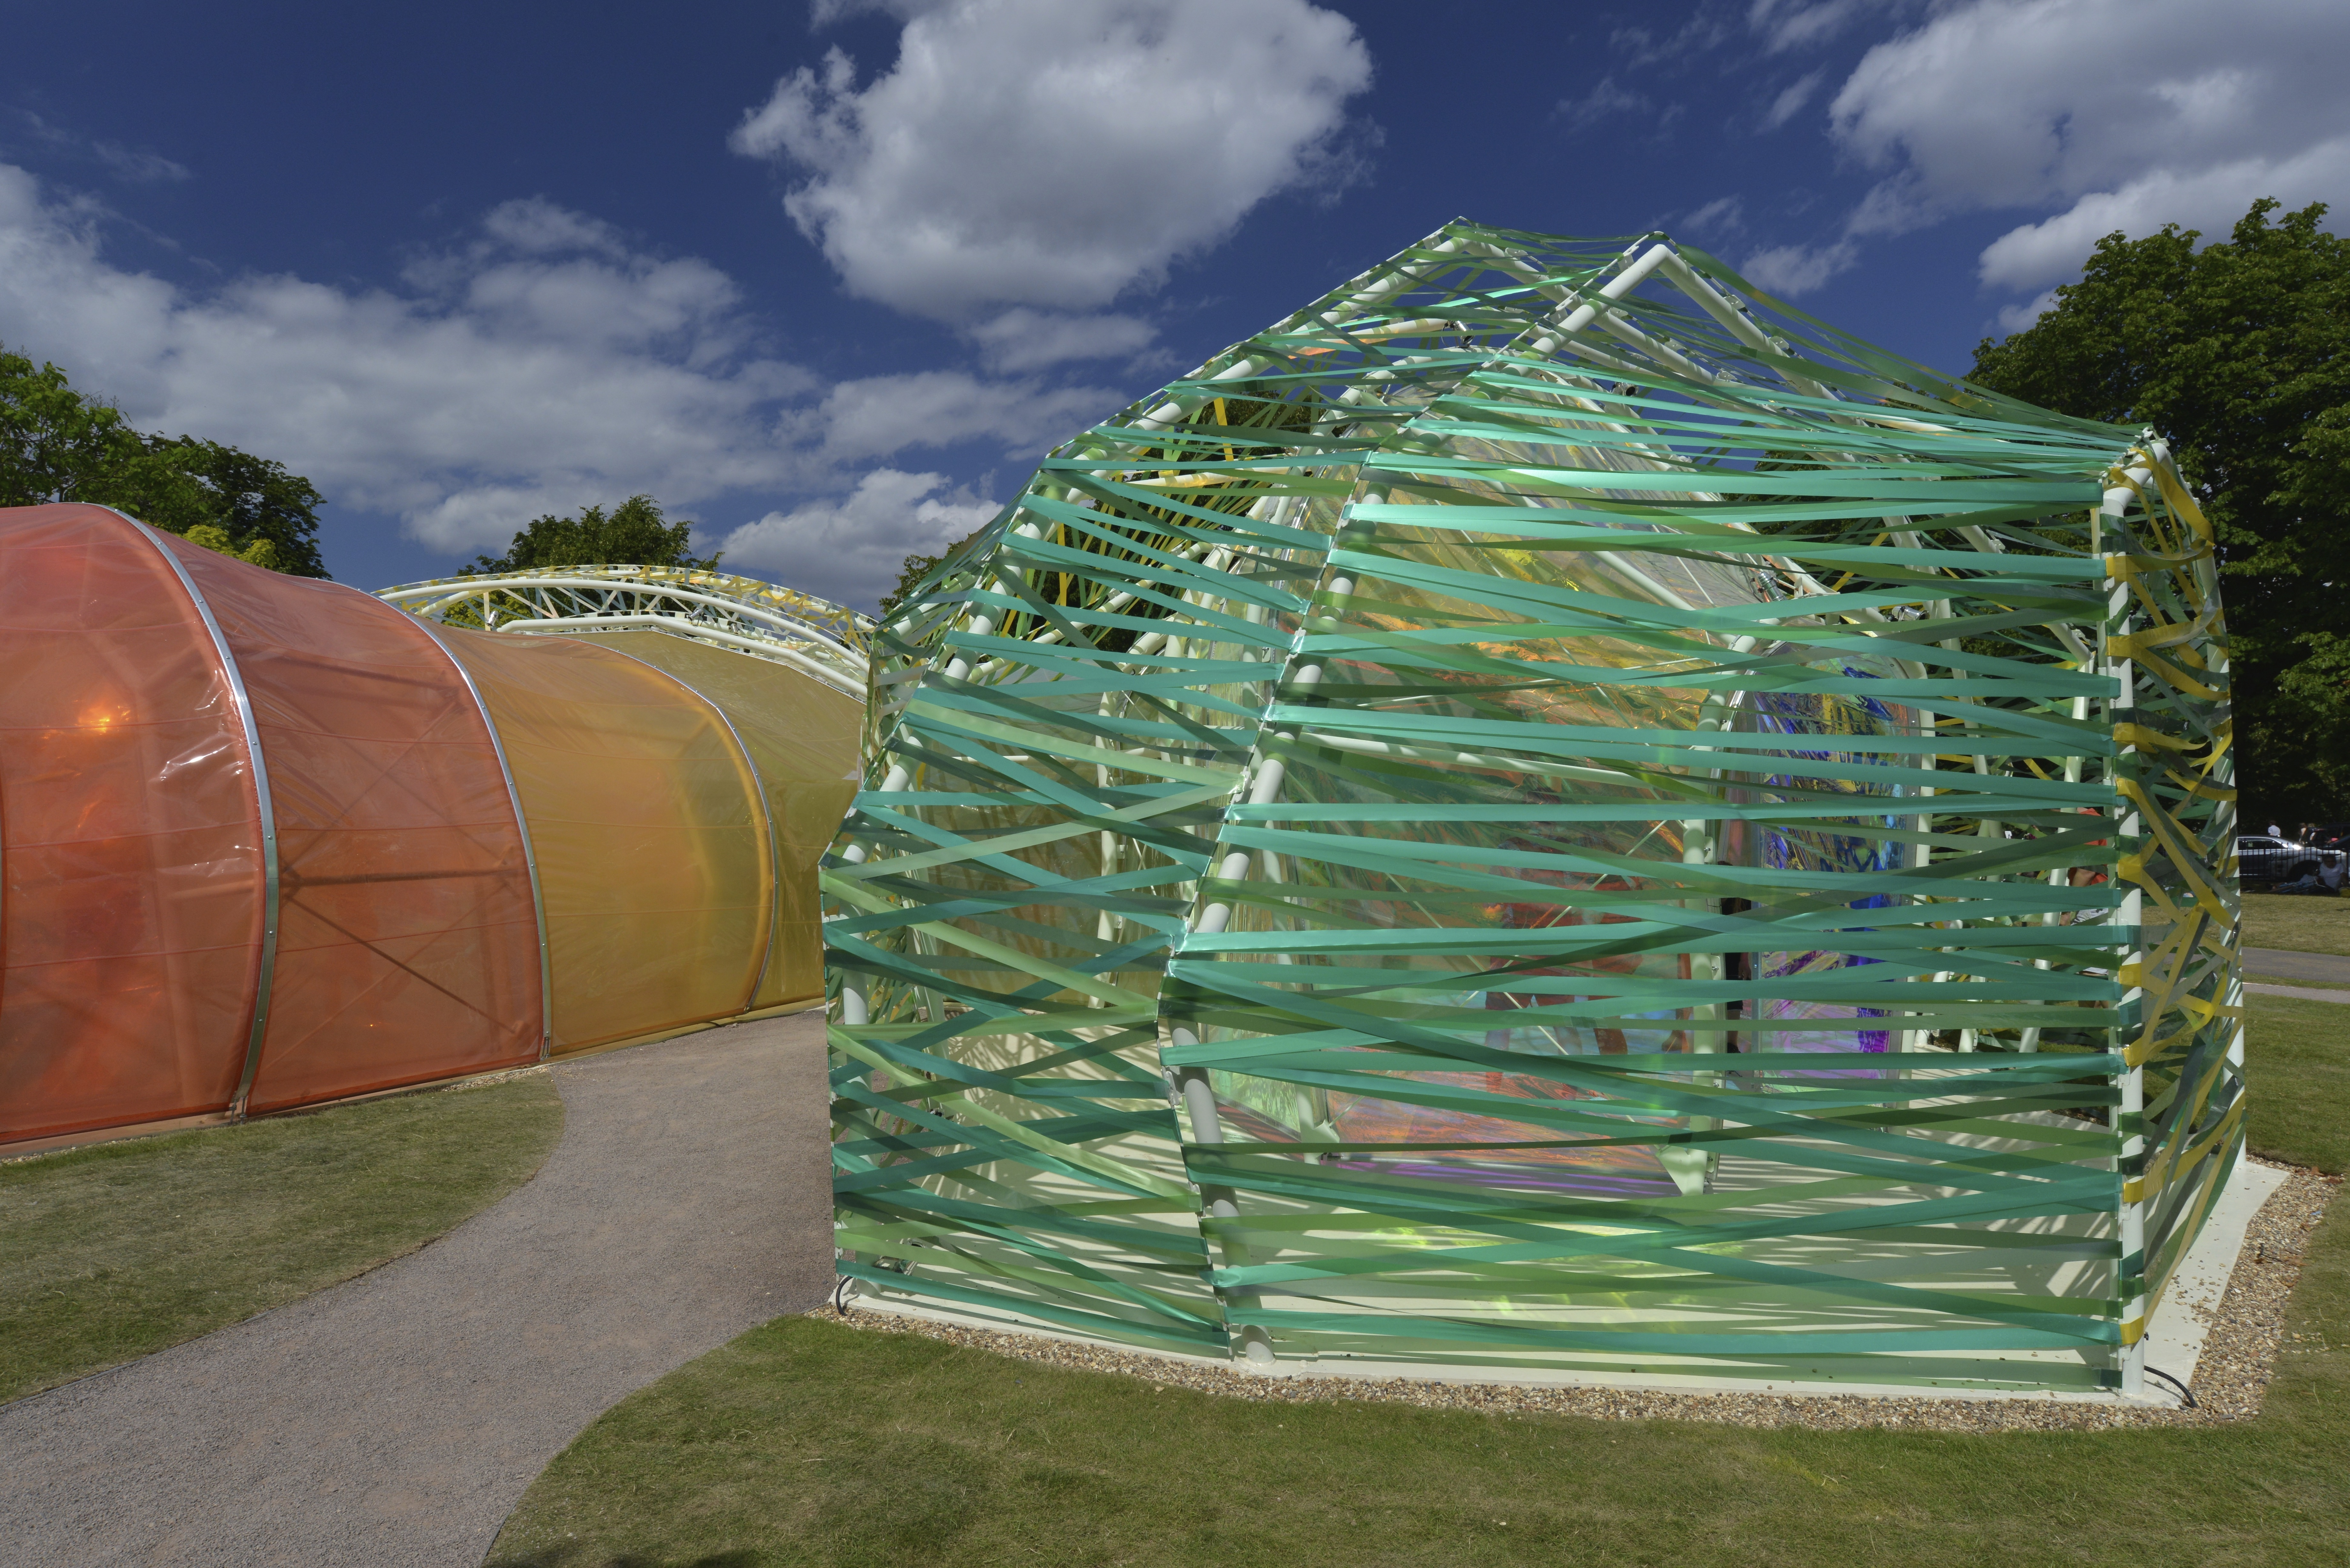 Serpentine Galleries Pavilion: Every design since 2000